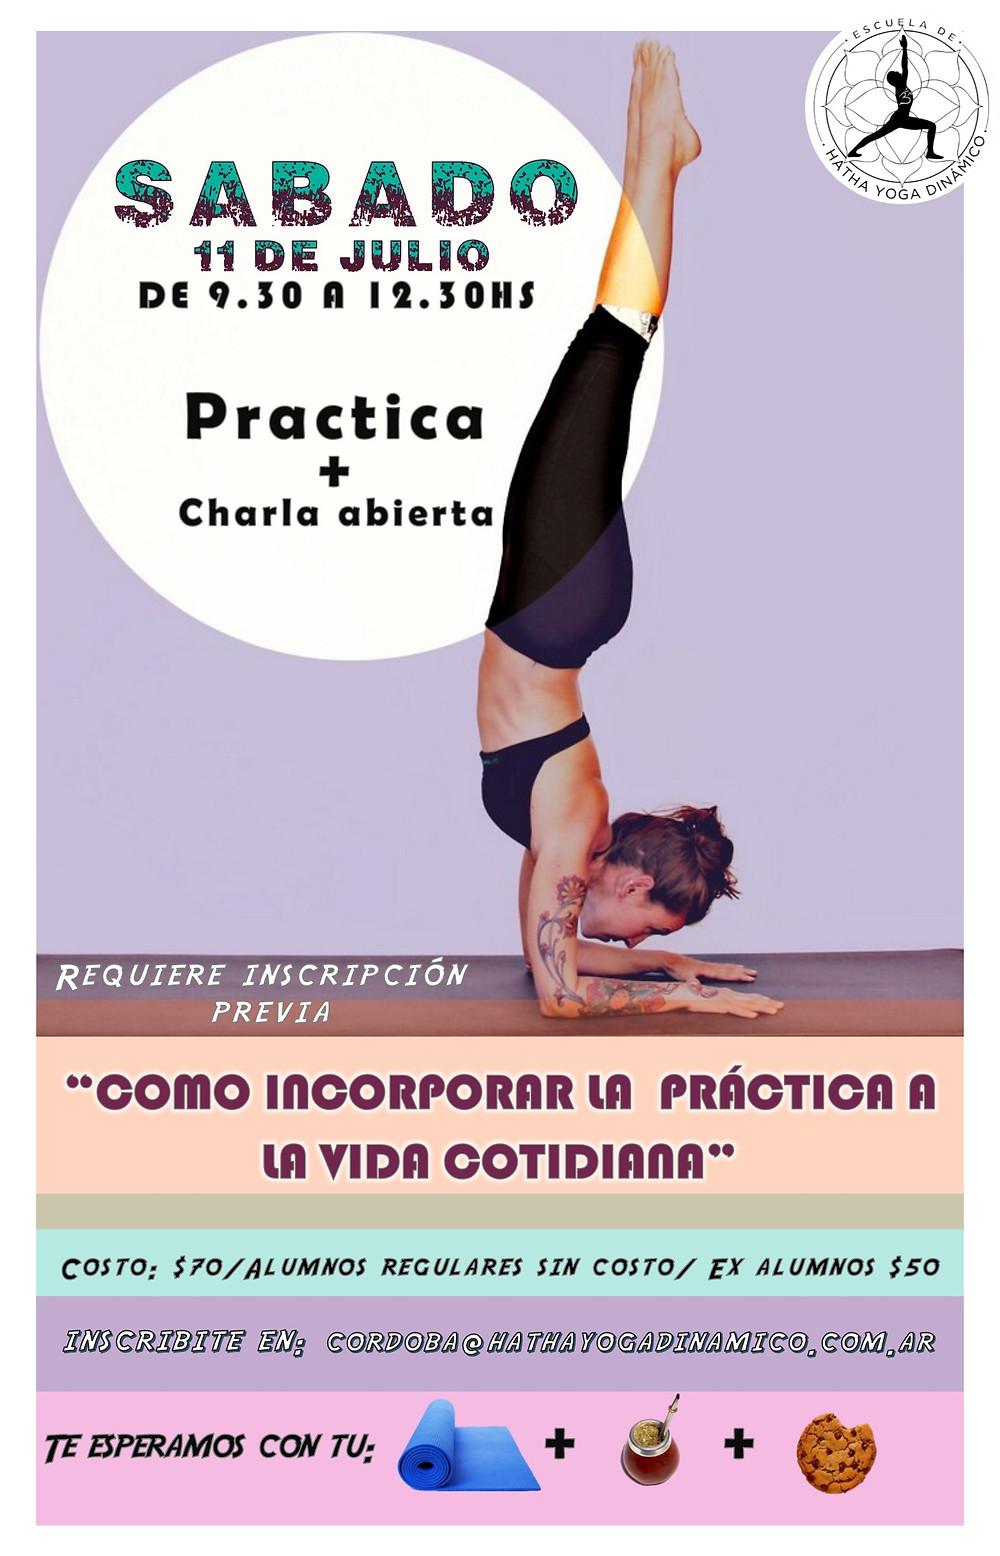 CLASEABIRTA+CHARLA.jpg